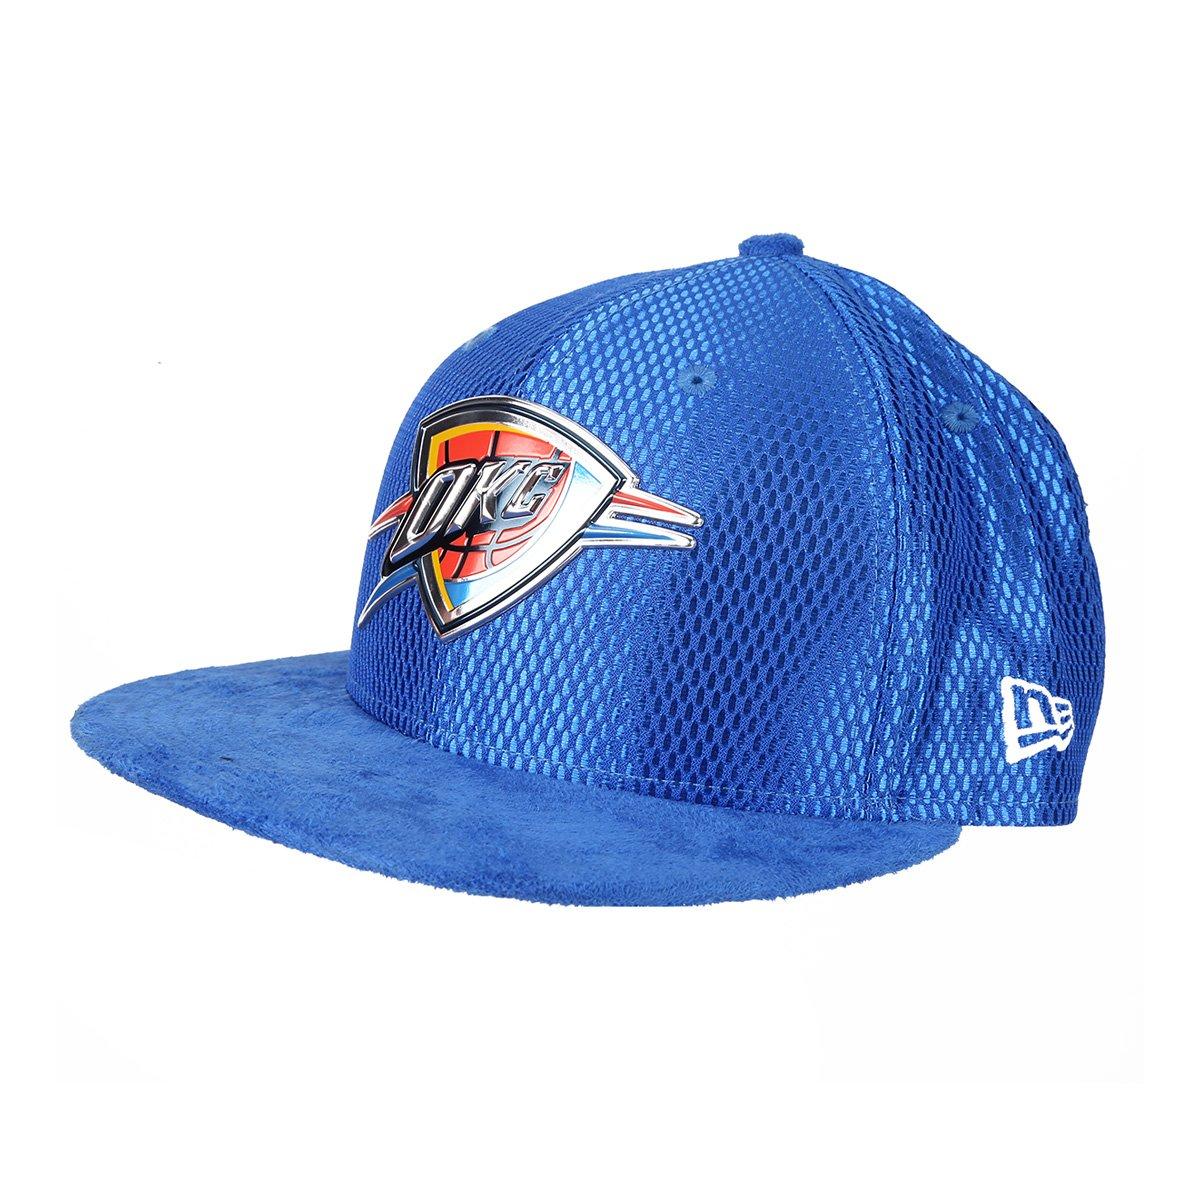 Boné New Era NBA Oklahoma City Thunder Aba Reta 950 SN 17 9dc803024a6